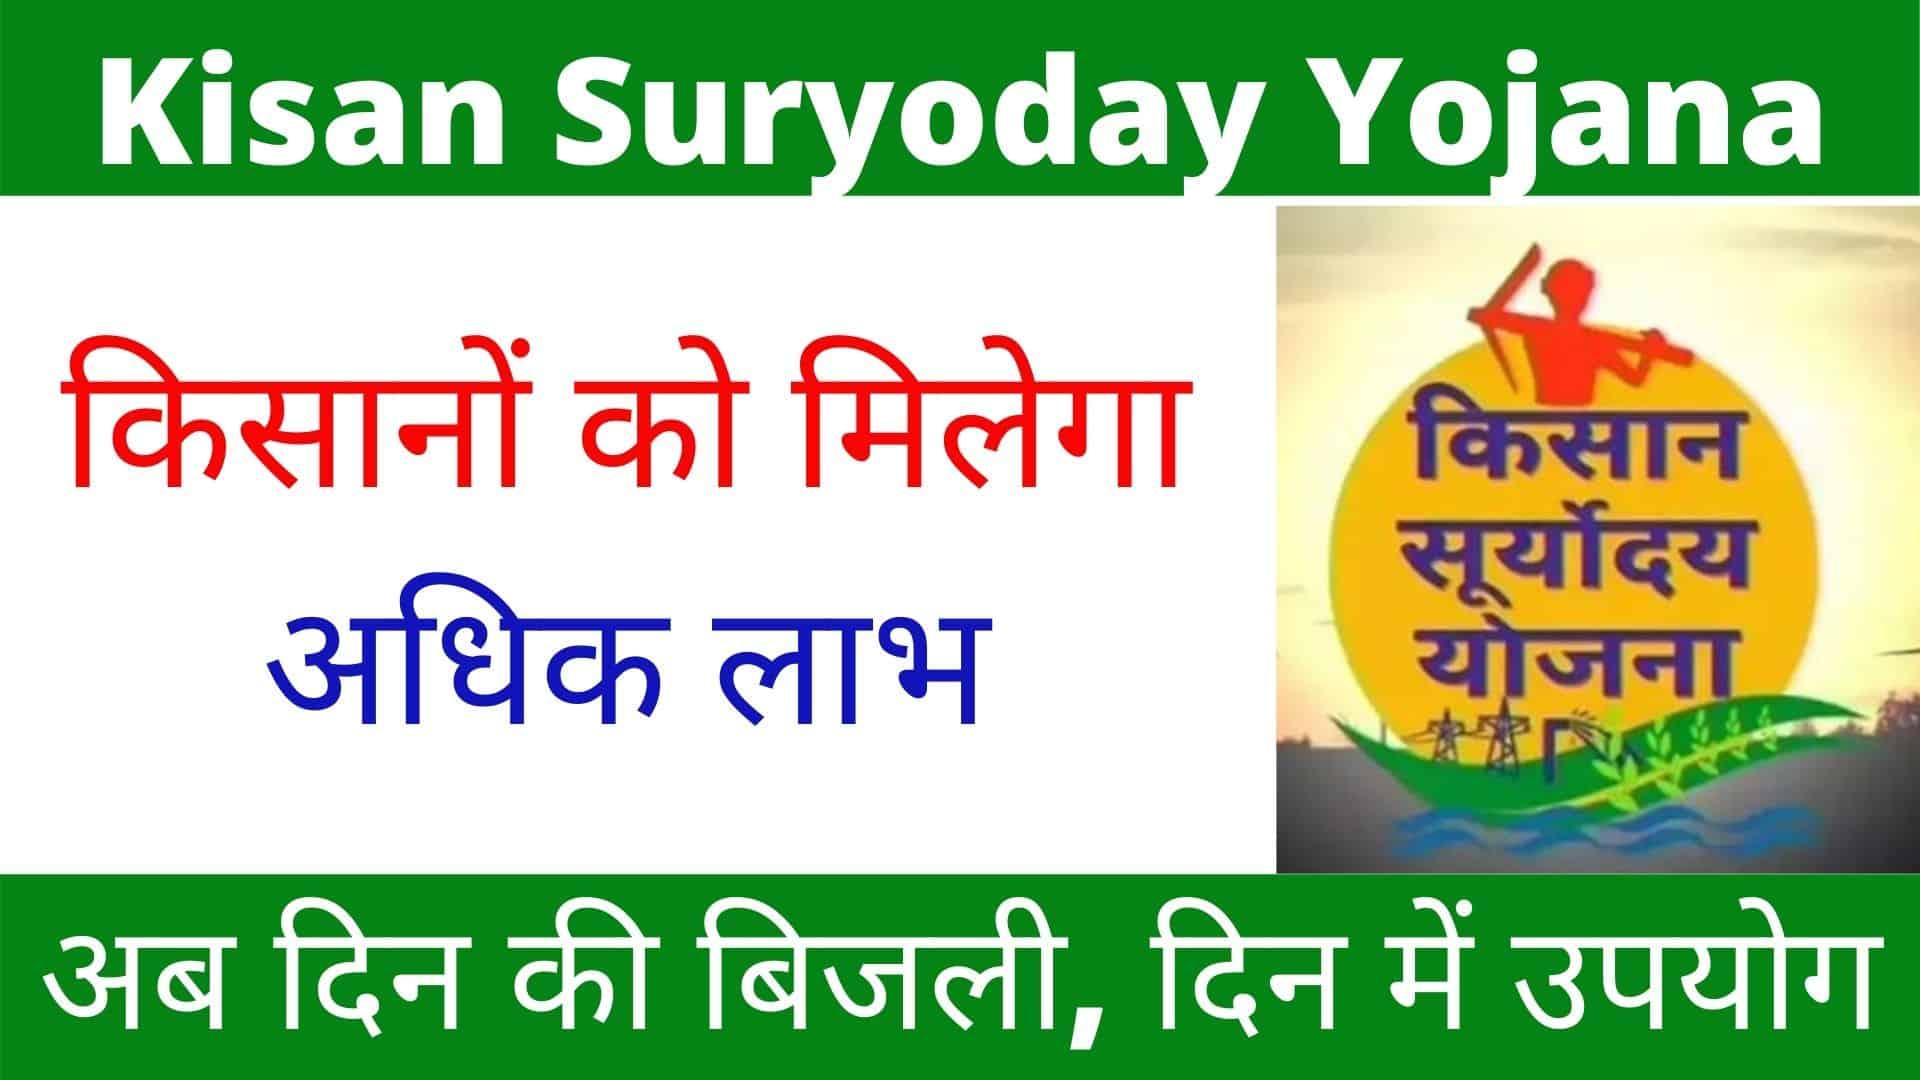 Kisan Suryoday Yojana